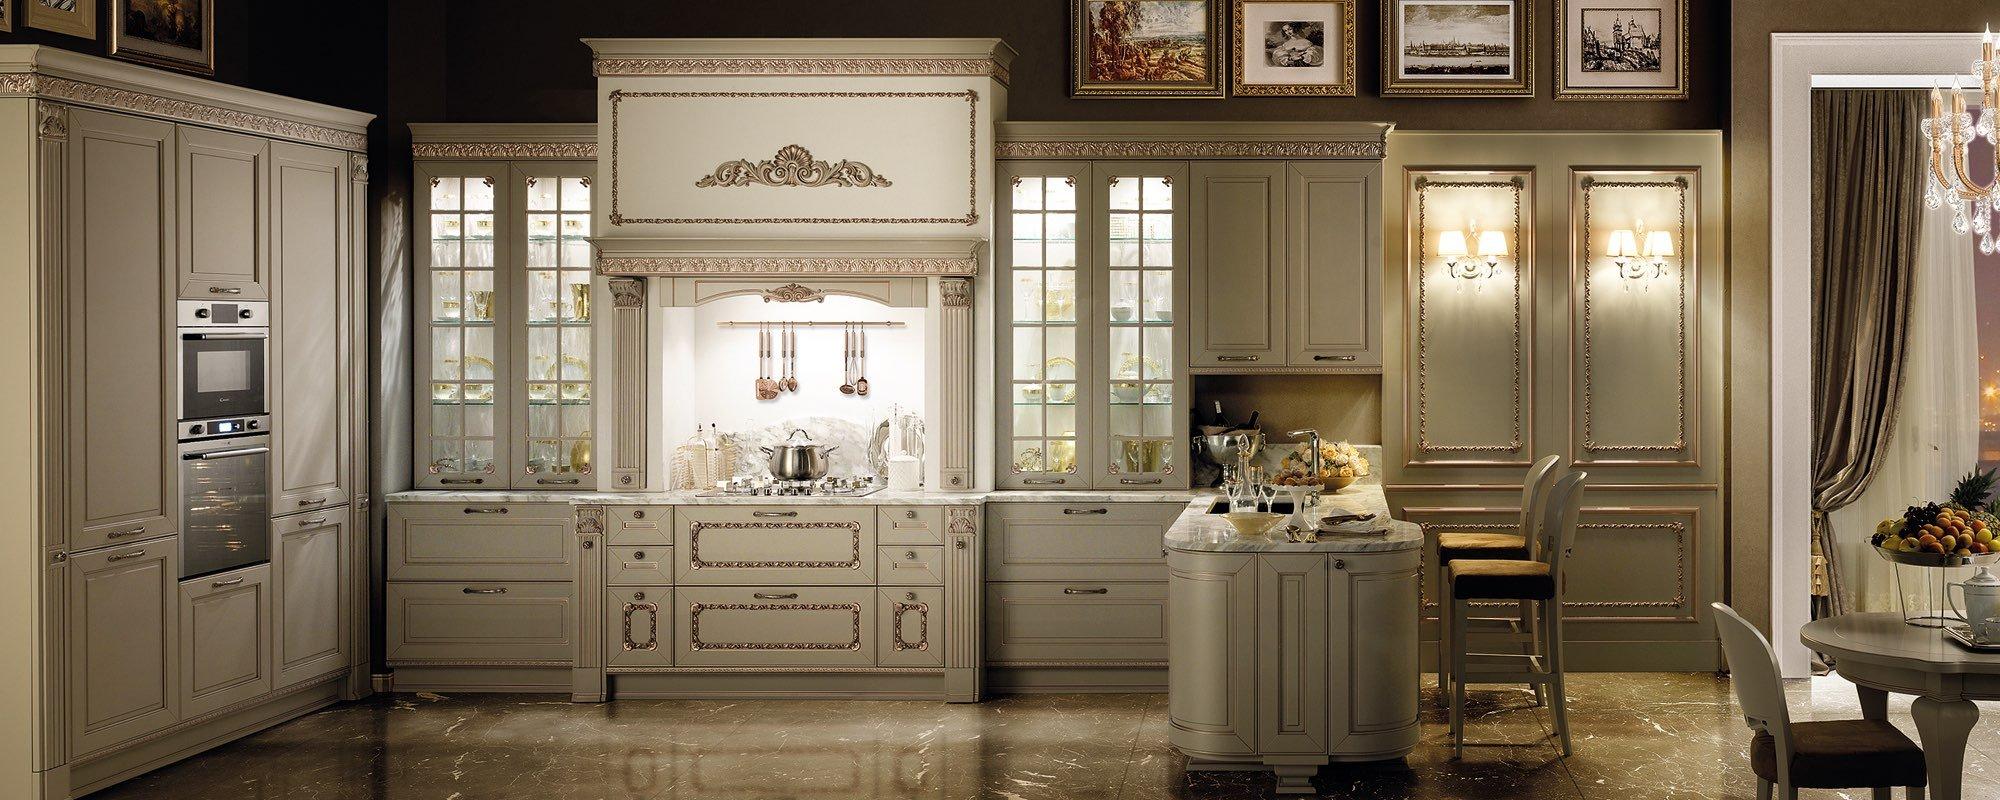 vista frontale di una cucina stosa -Dolcevita